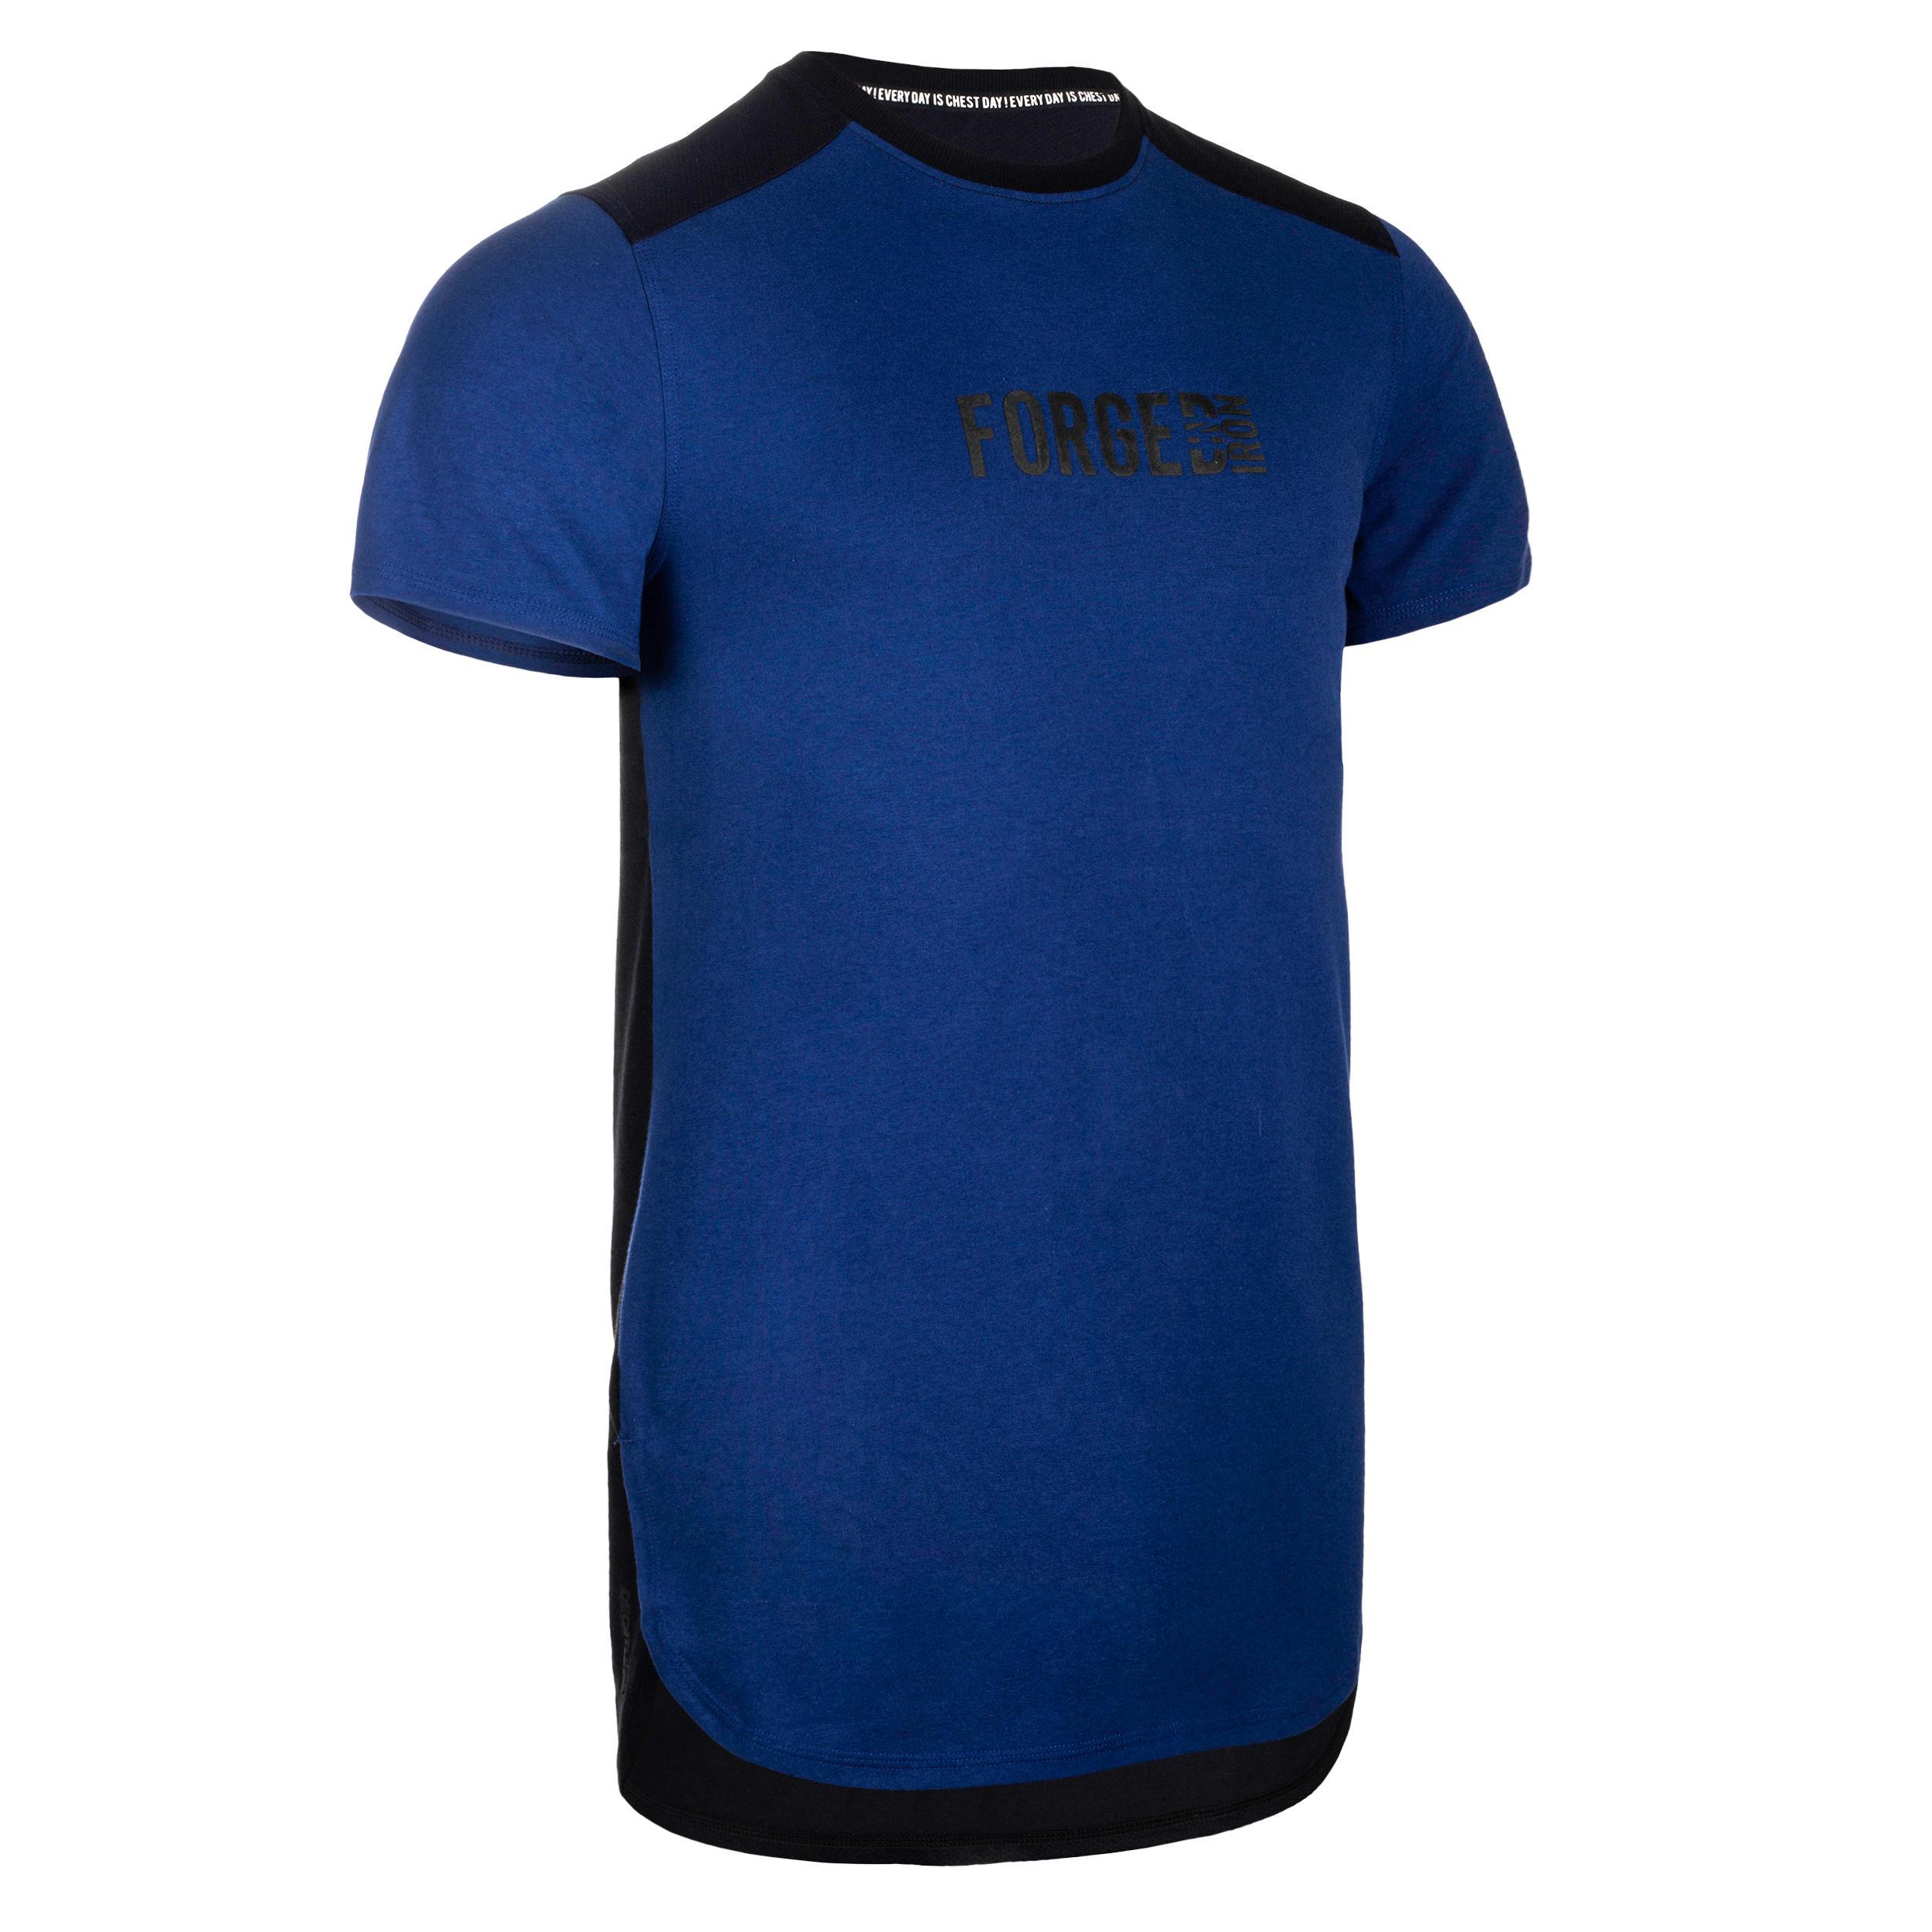 Tricou CHEST DAY albastru imagine